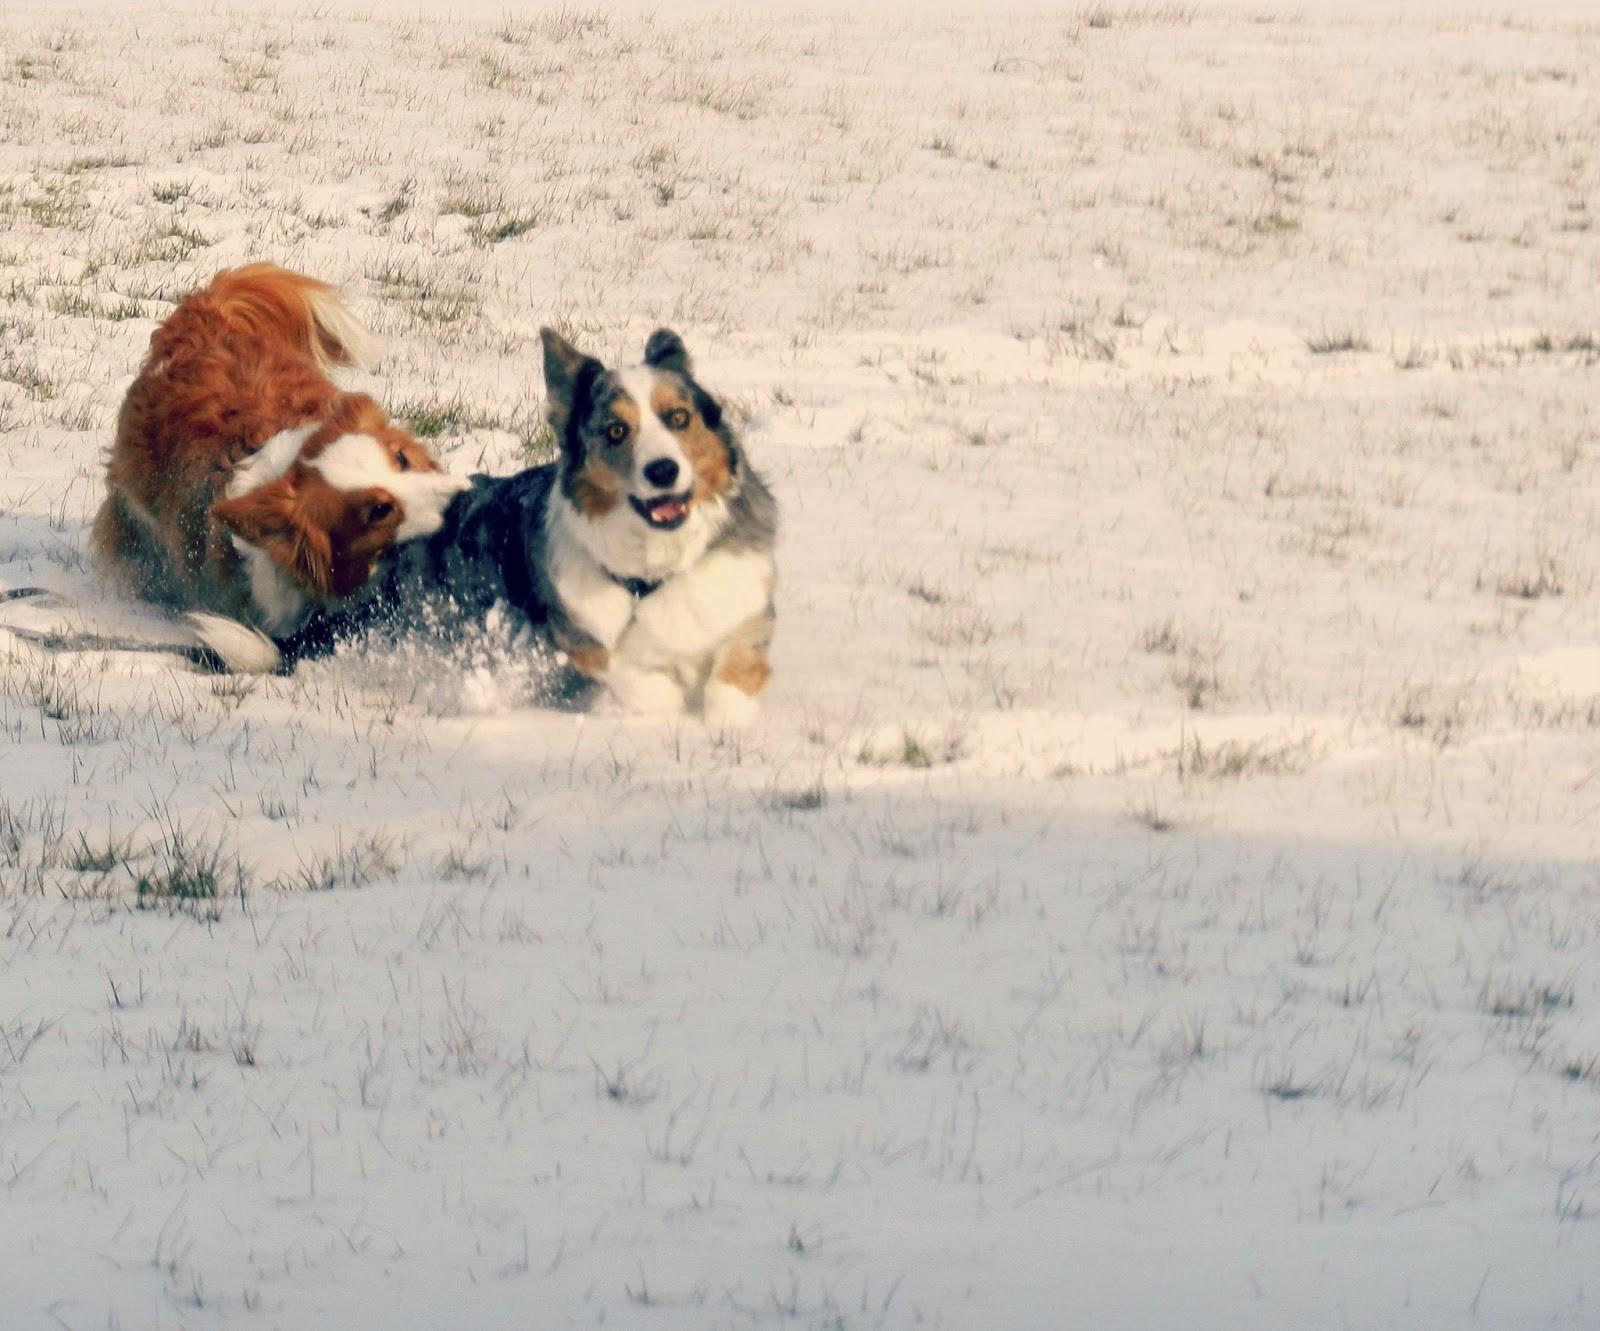 Snow Dogs Bite Ear Scene